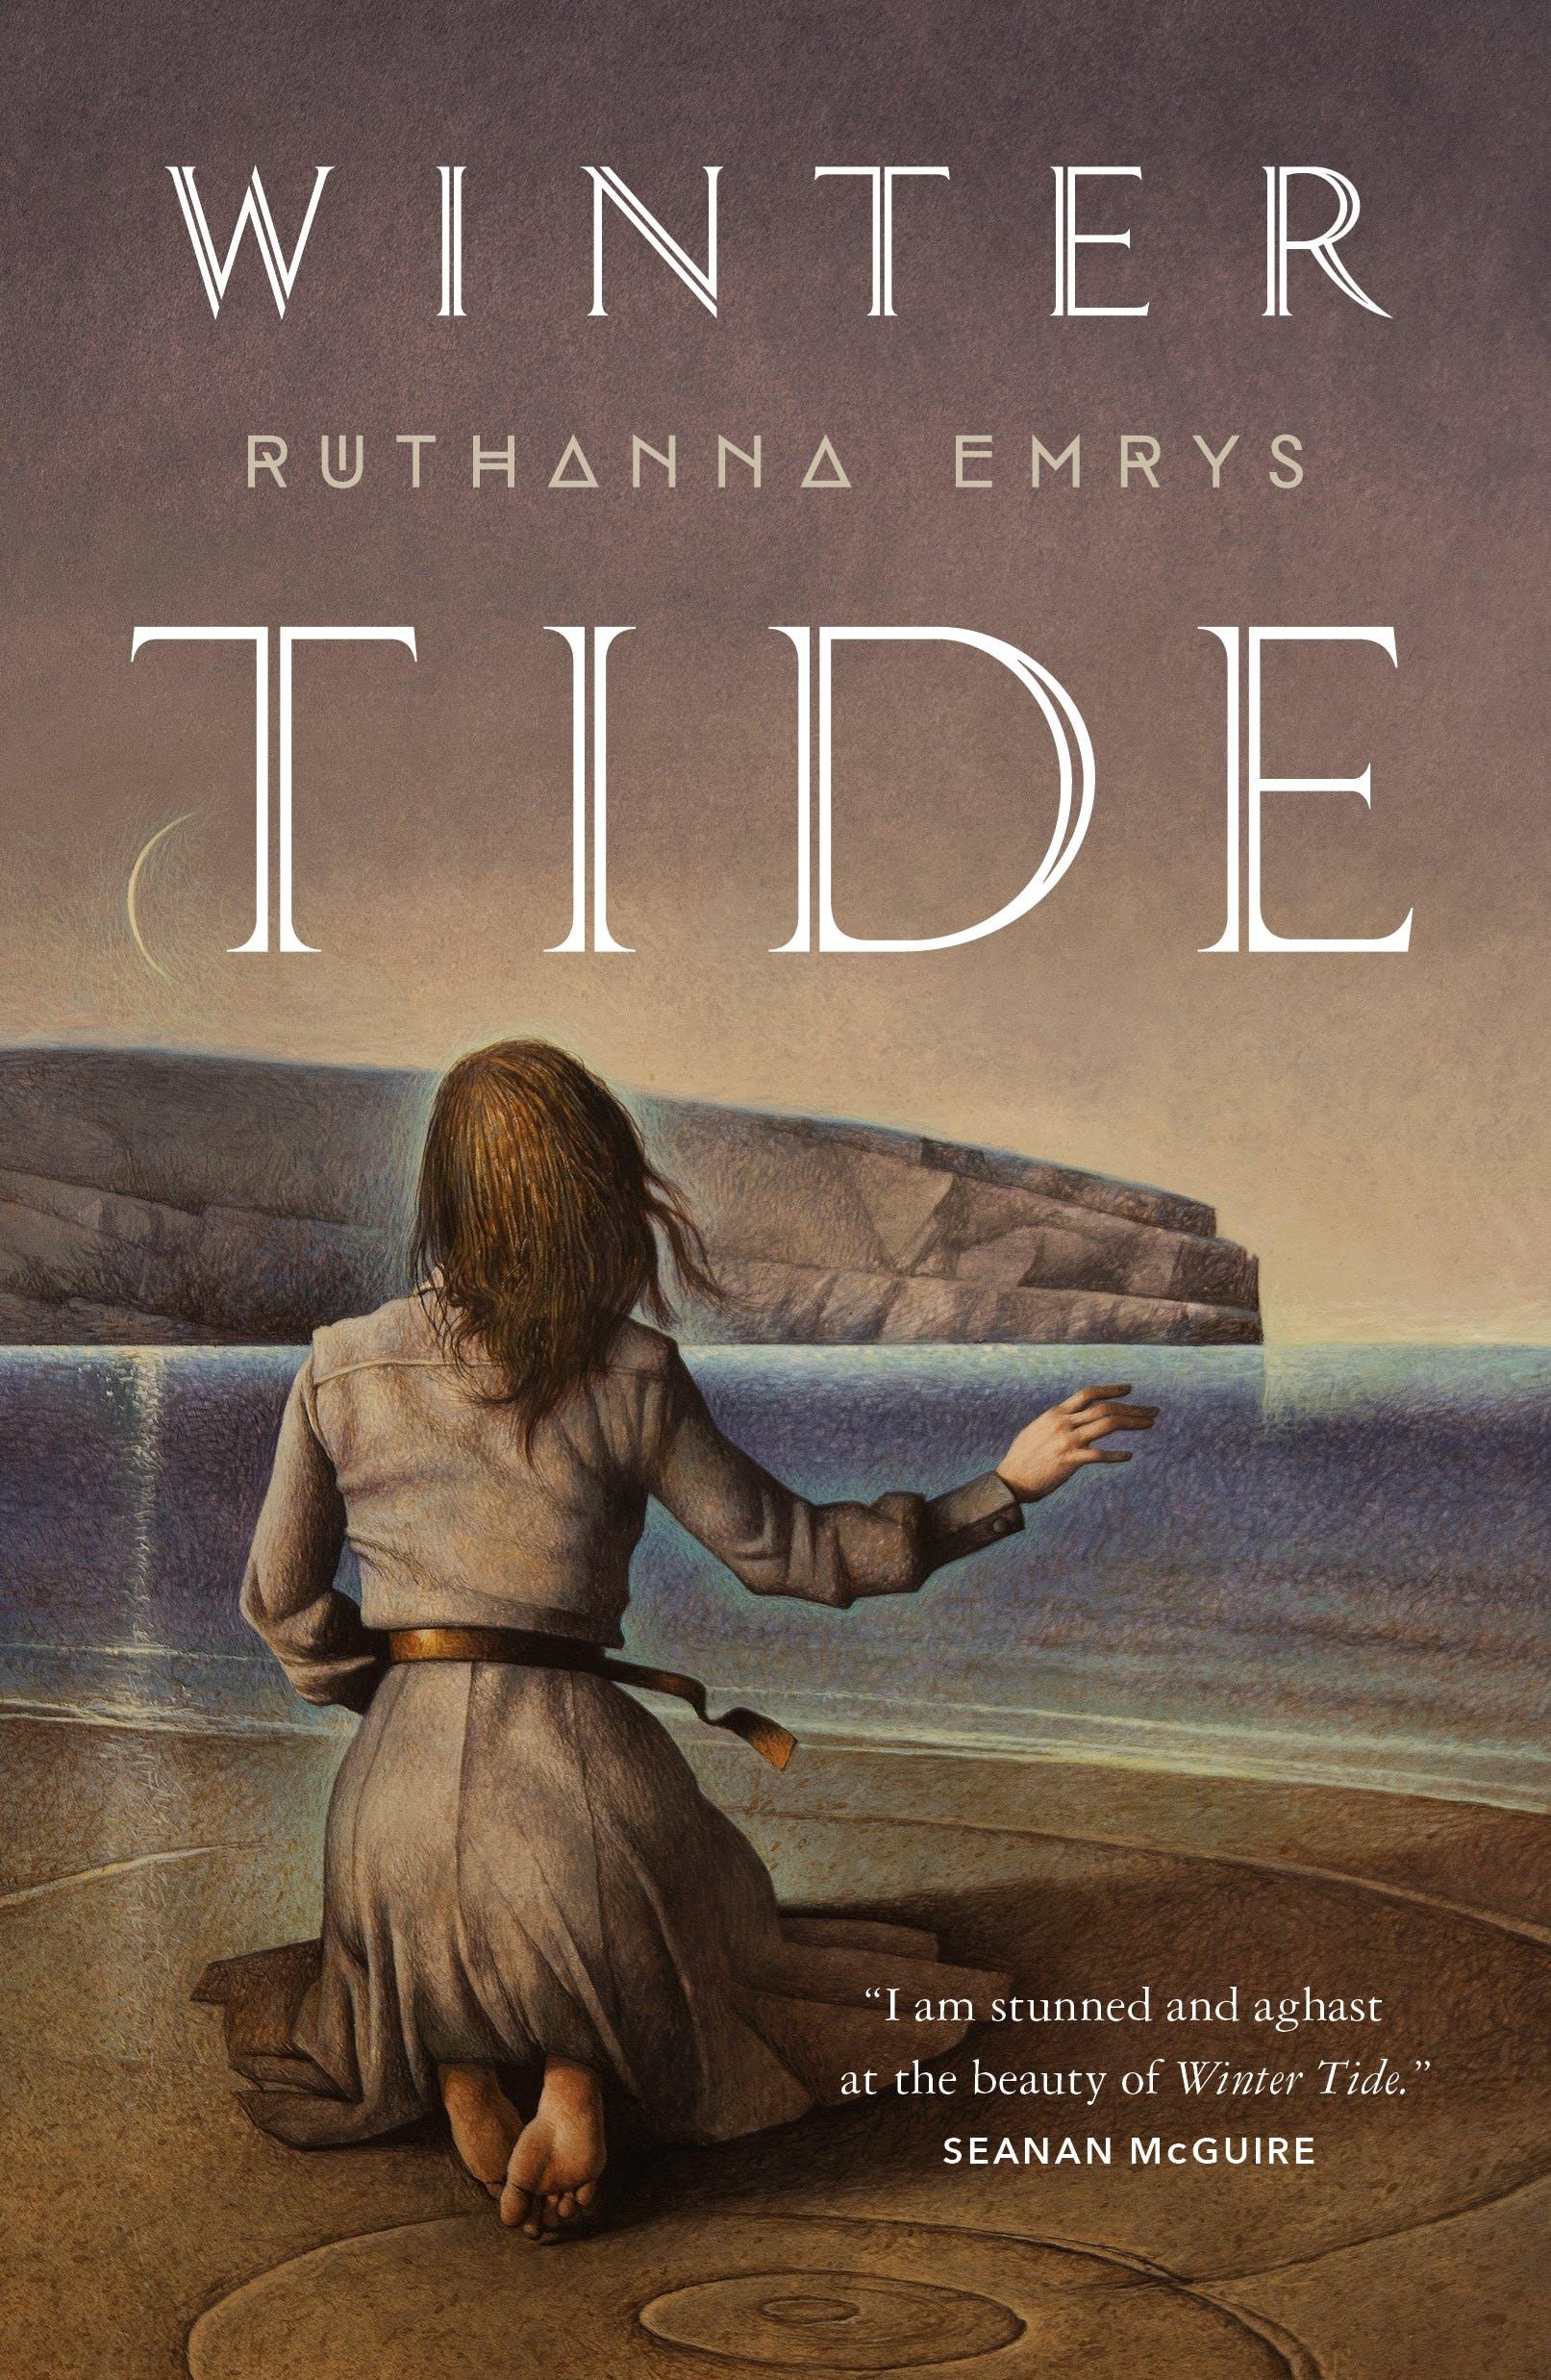 Image of Winter Tide